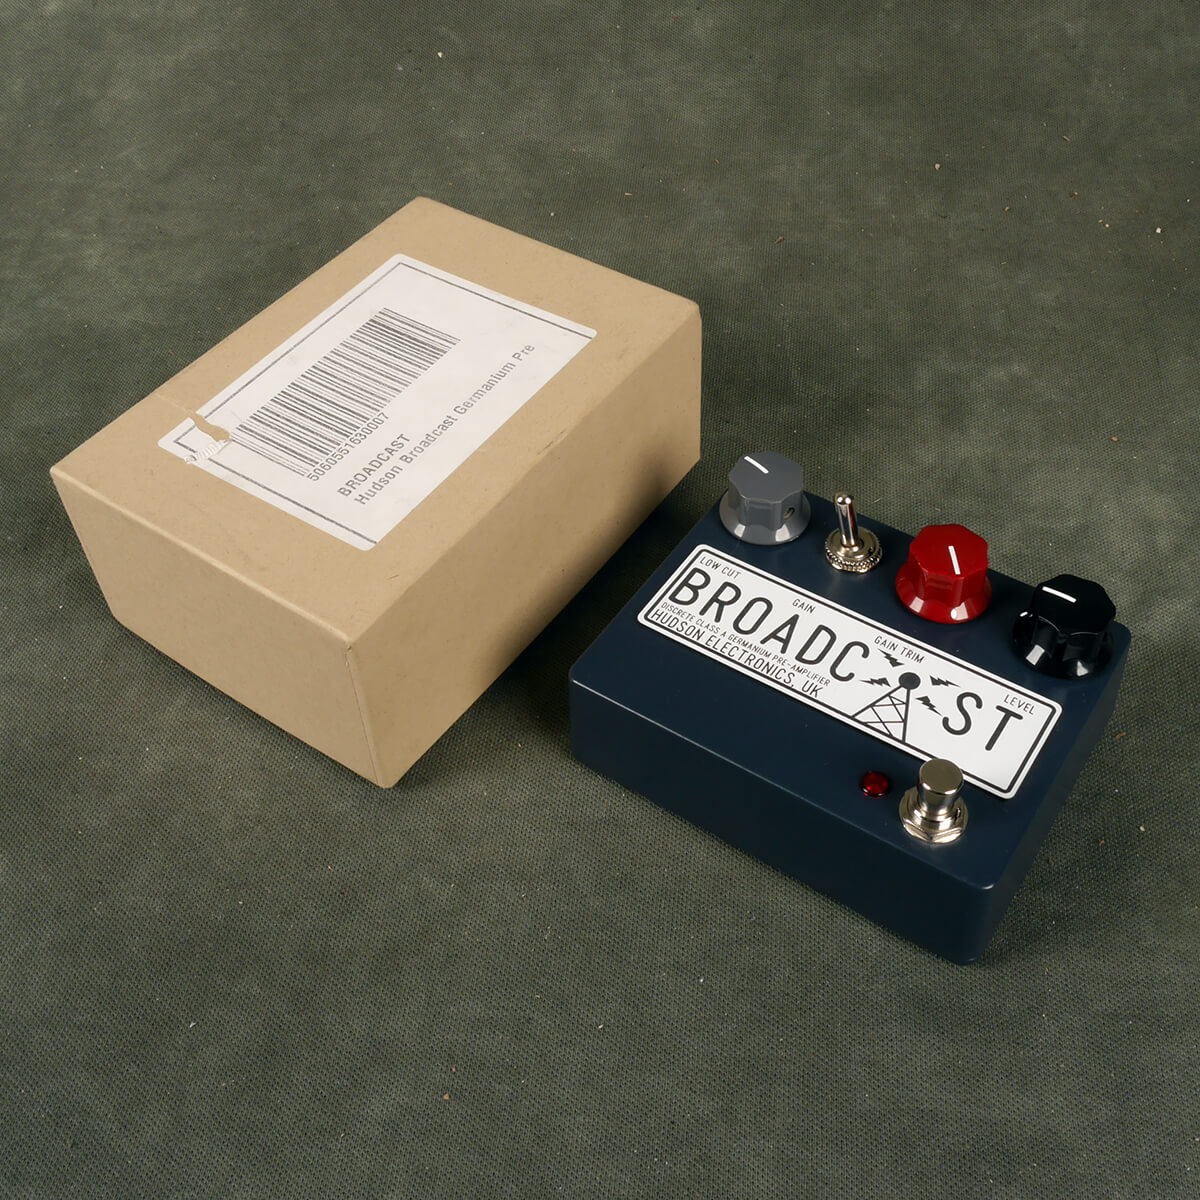 Hudson Broadcast Discrete Class A Germainium Pre Amp w/Box - 2nd Hand